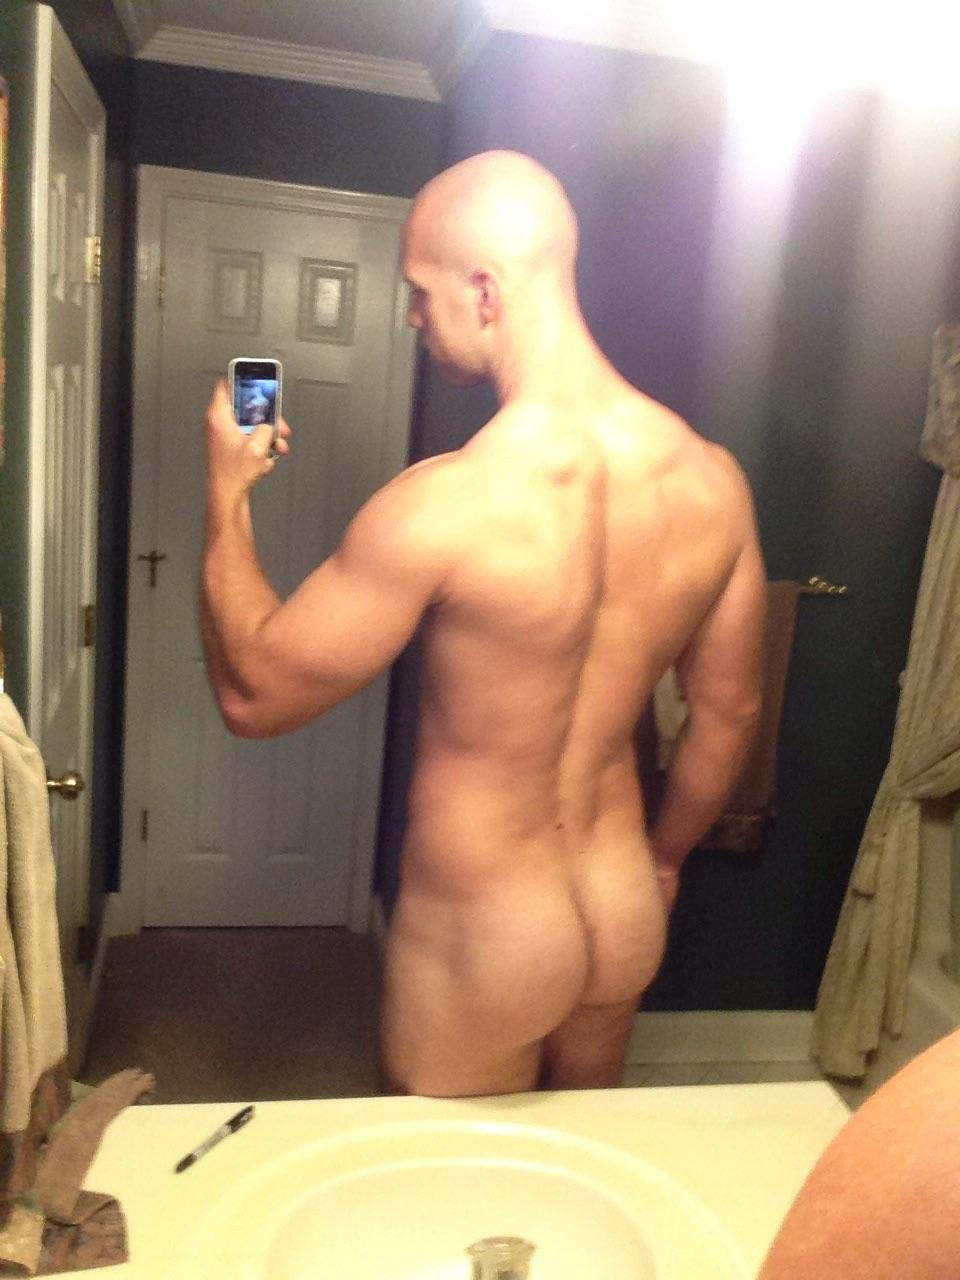 Danielle cushman nude pics-6575